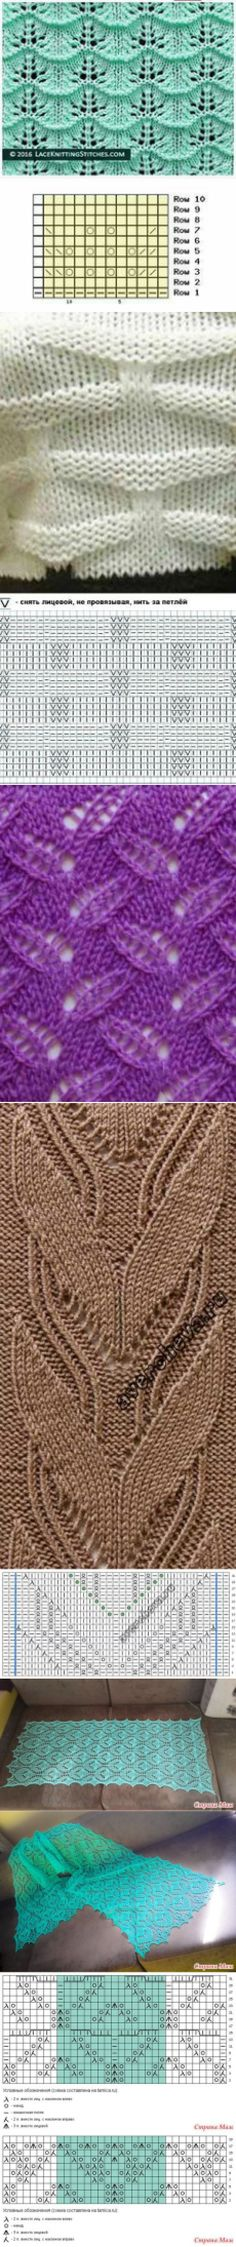 Lace Knitting Patterns, Knitting Stiches, Loom Knitting, Knitting Needles, Free Knitting, Stitch Patterns, Crochet Motif, Knit Crochet, Woolen Craft